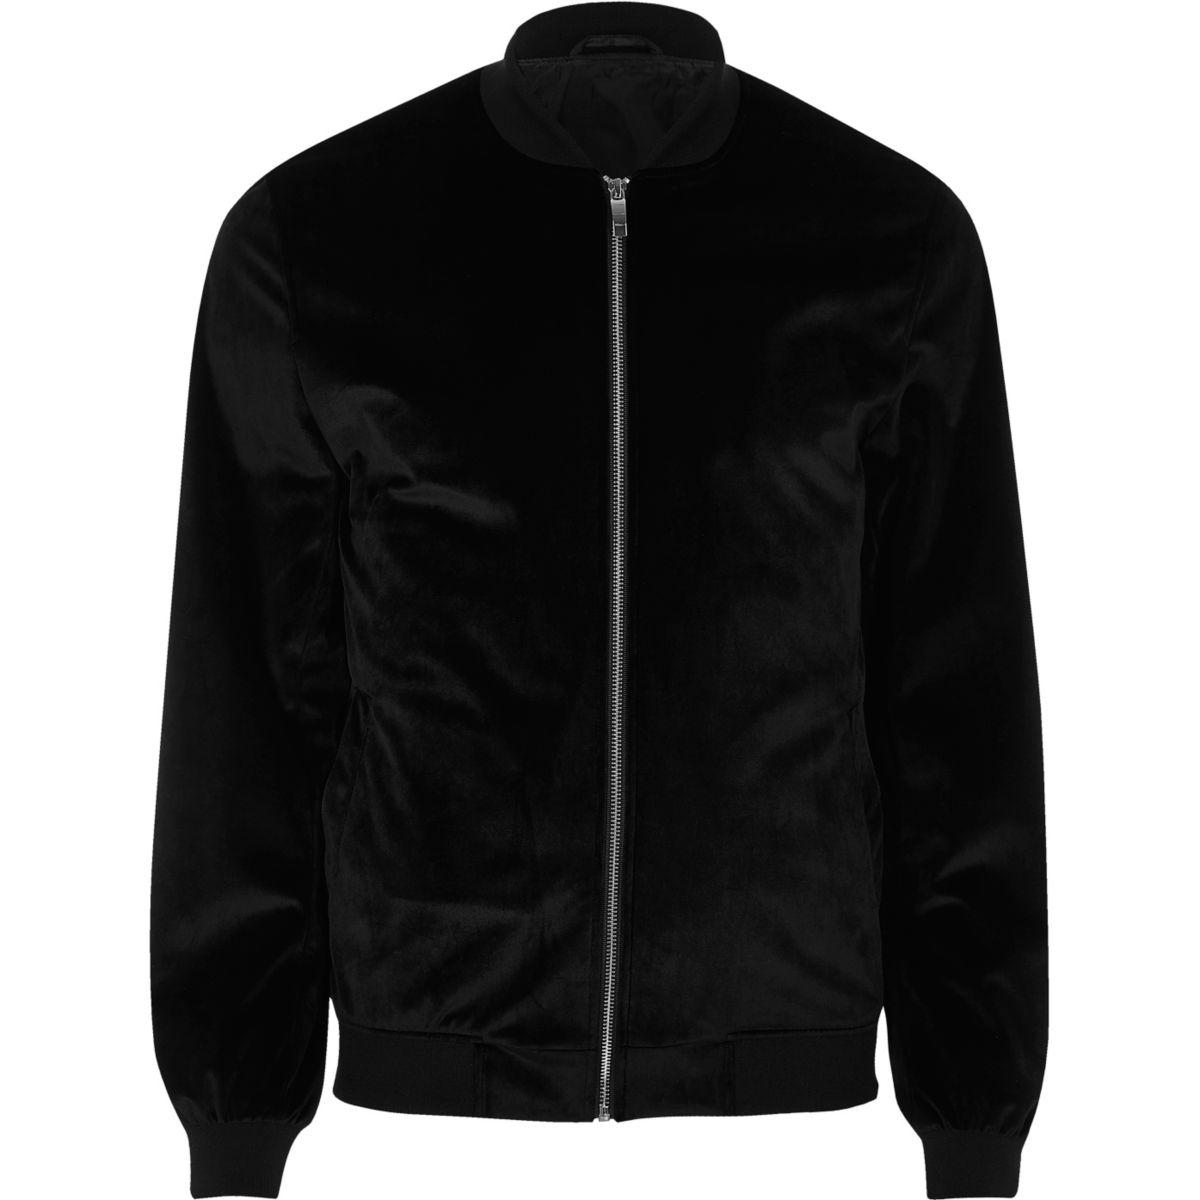 Black velvet bomber jacket - Coats & Jackets - Sale - men